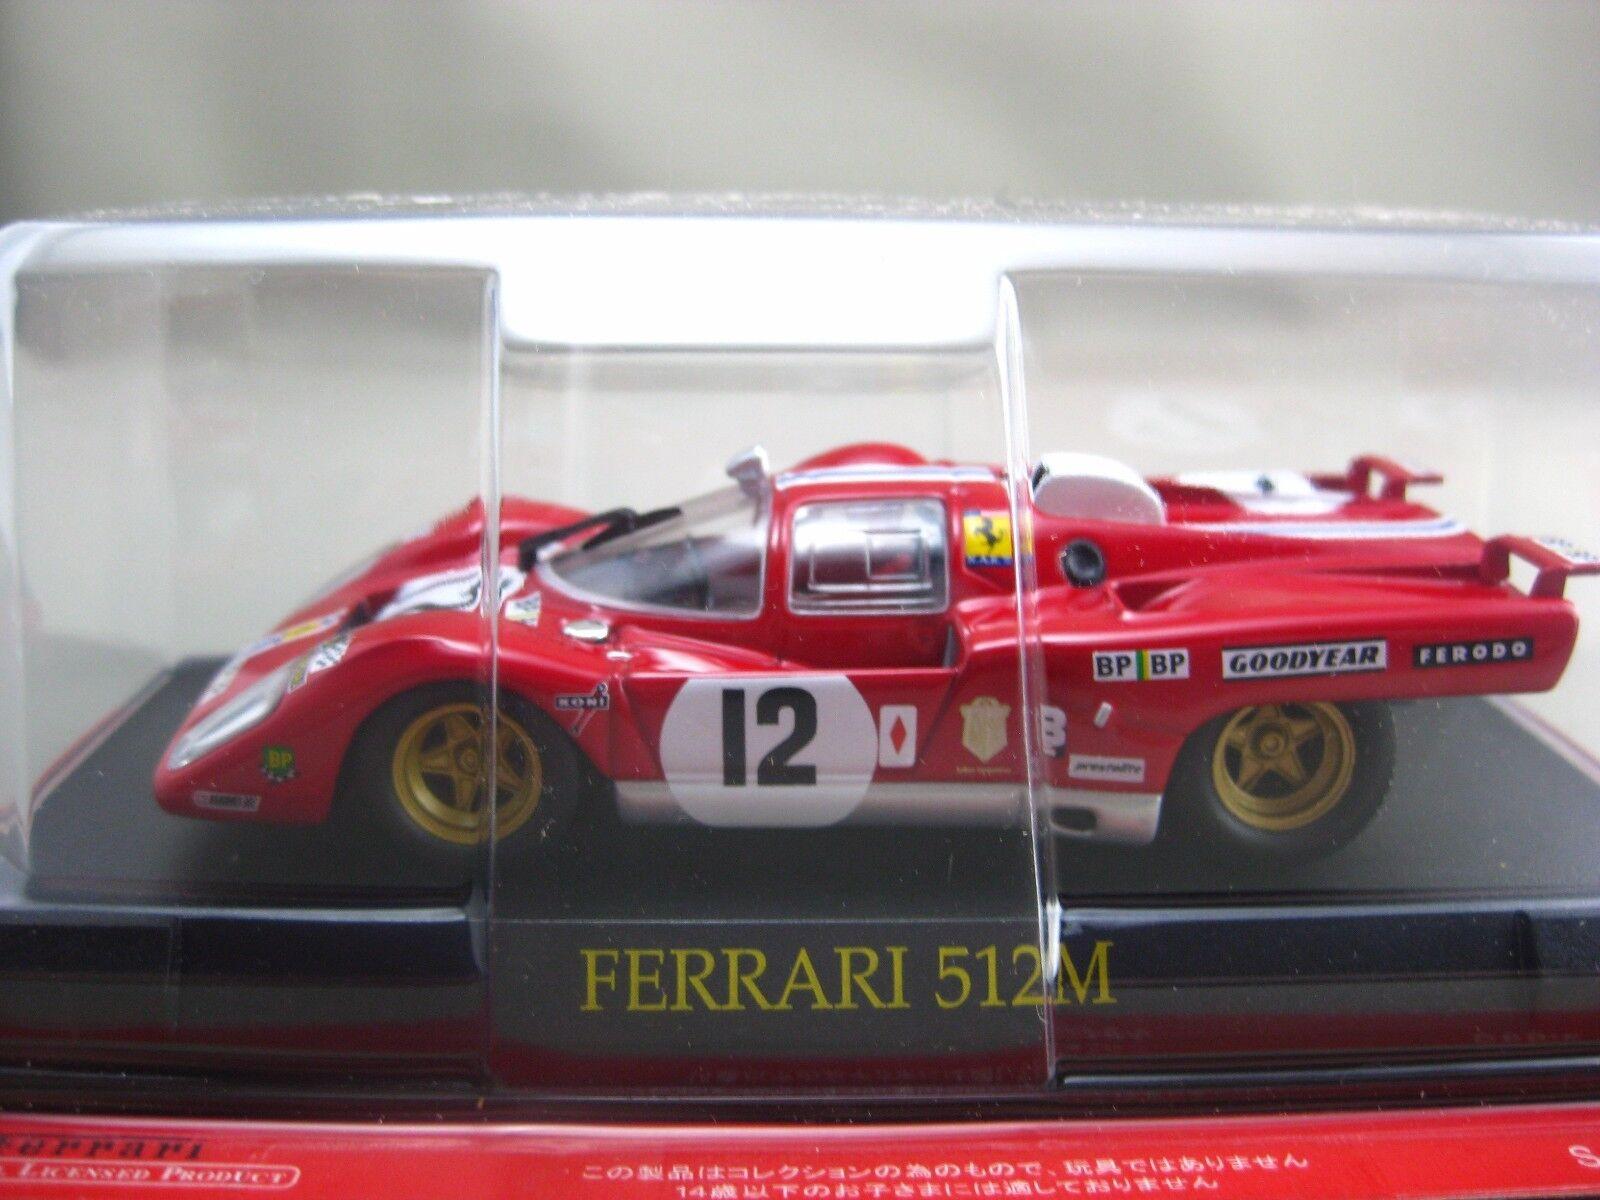 Ferrari 512M hachette 1 43 Diecast car Vol.64